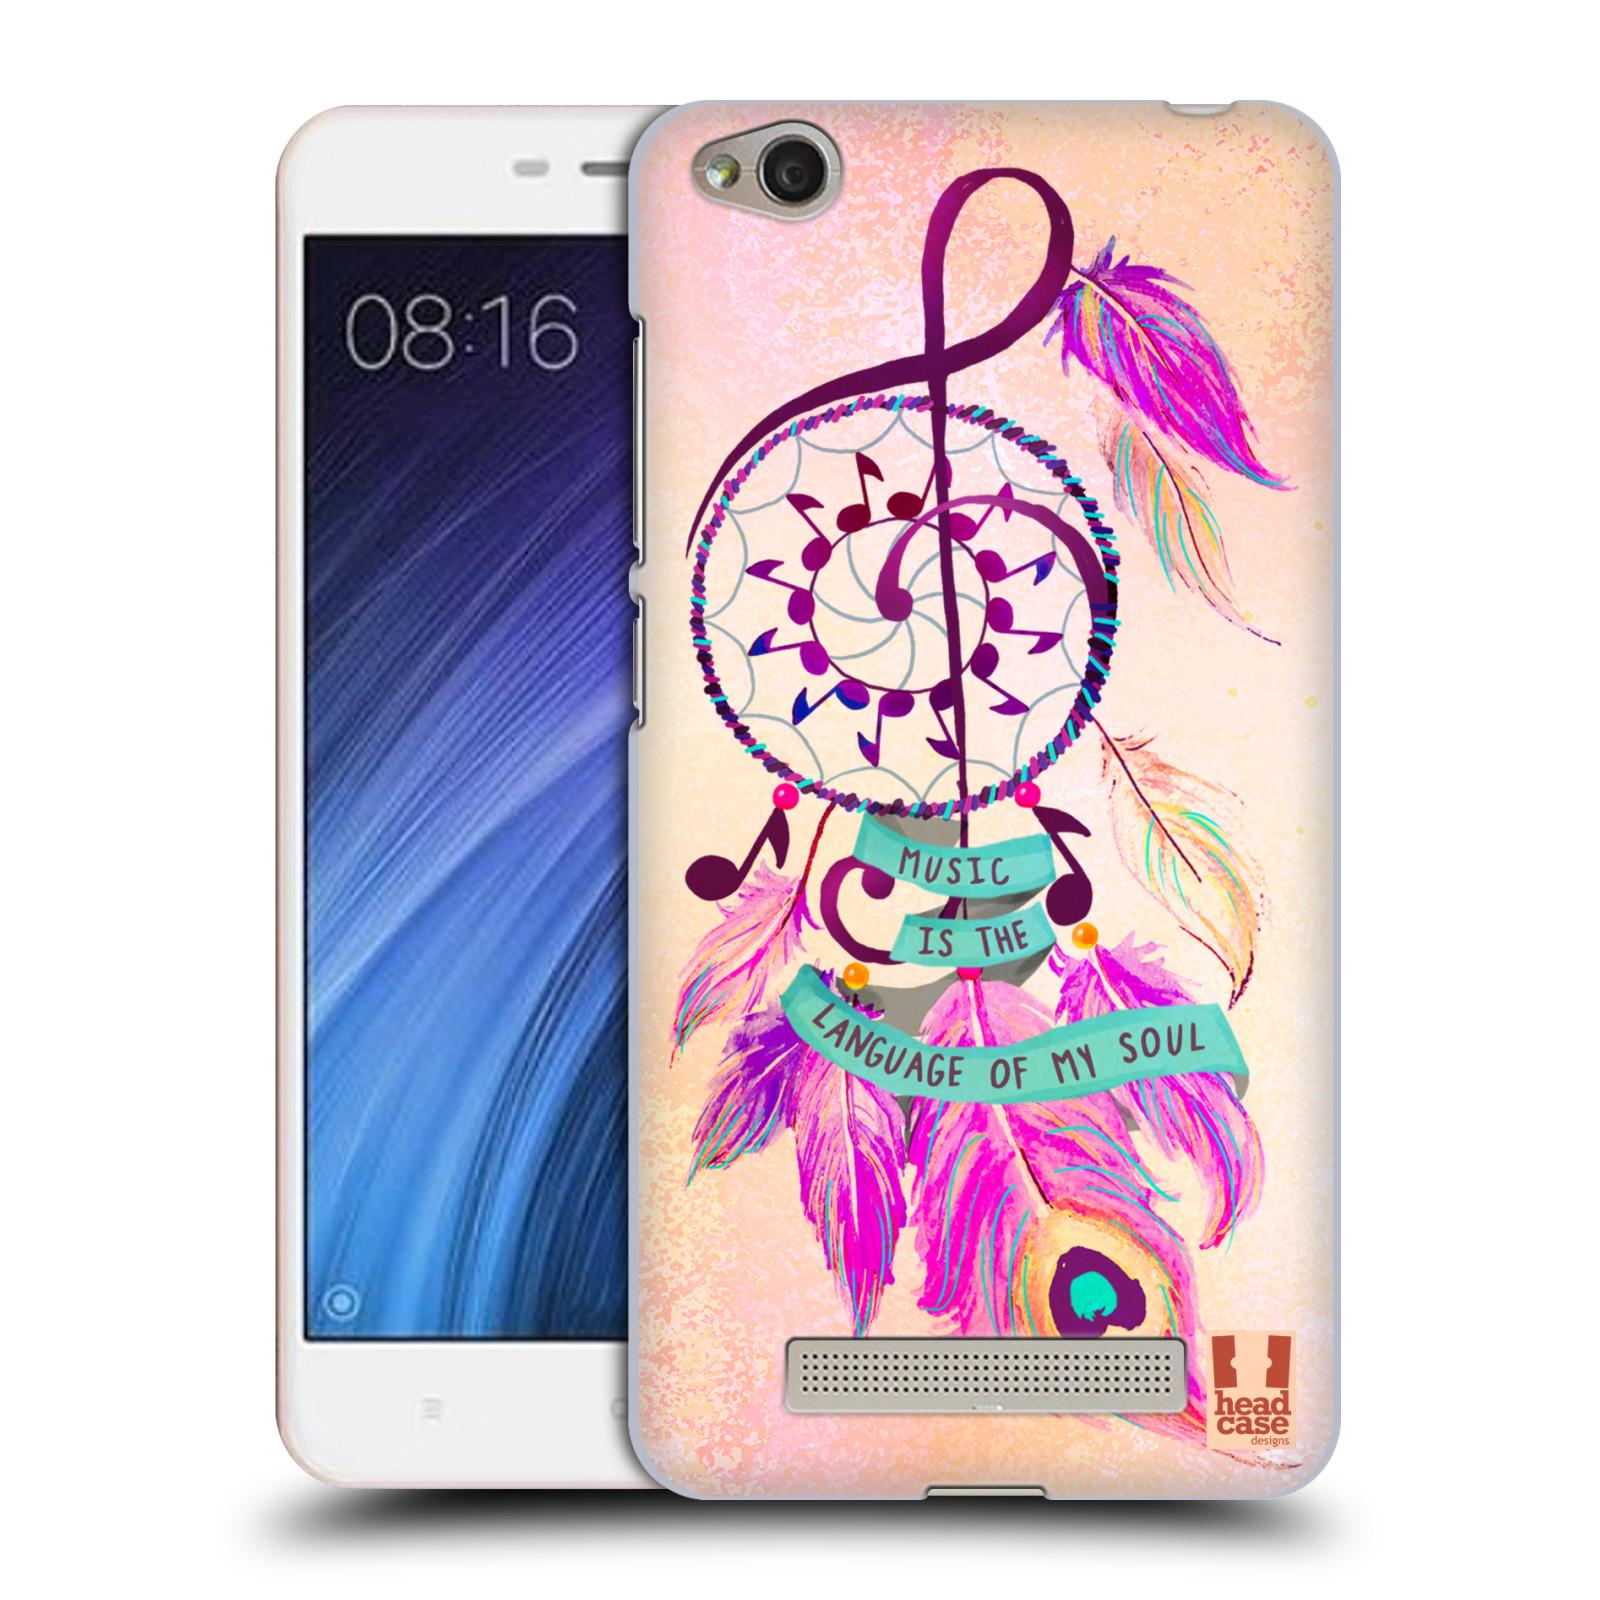 Plastové pouzdro na mobil Xiaomi Redmi 4A HEAD CASE Lapač Assorted Music  empty 9de0a16de61